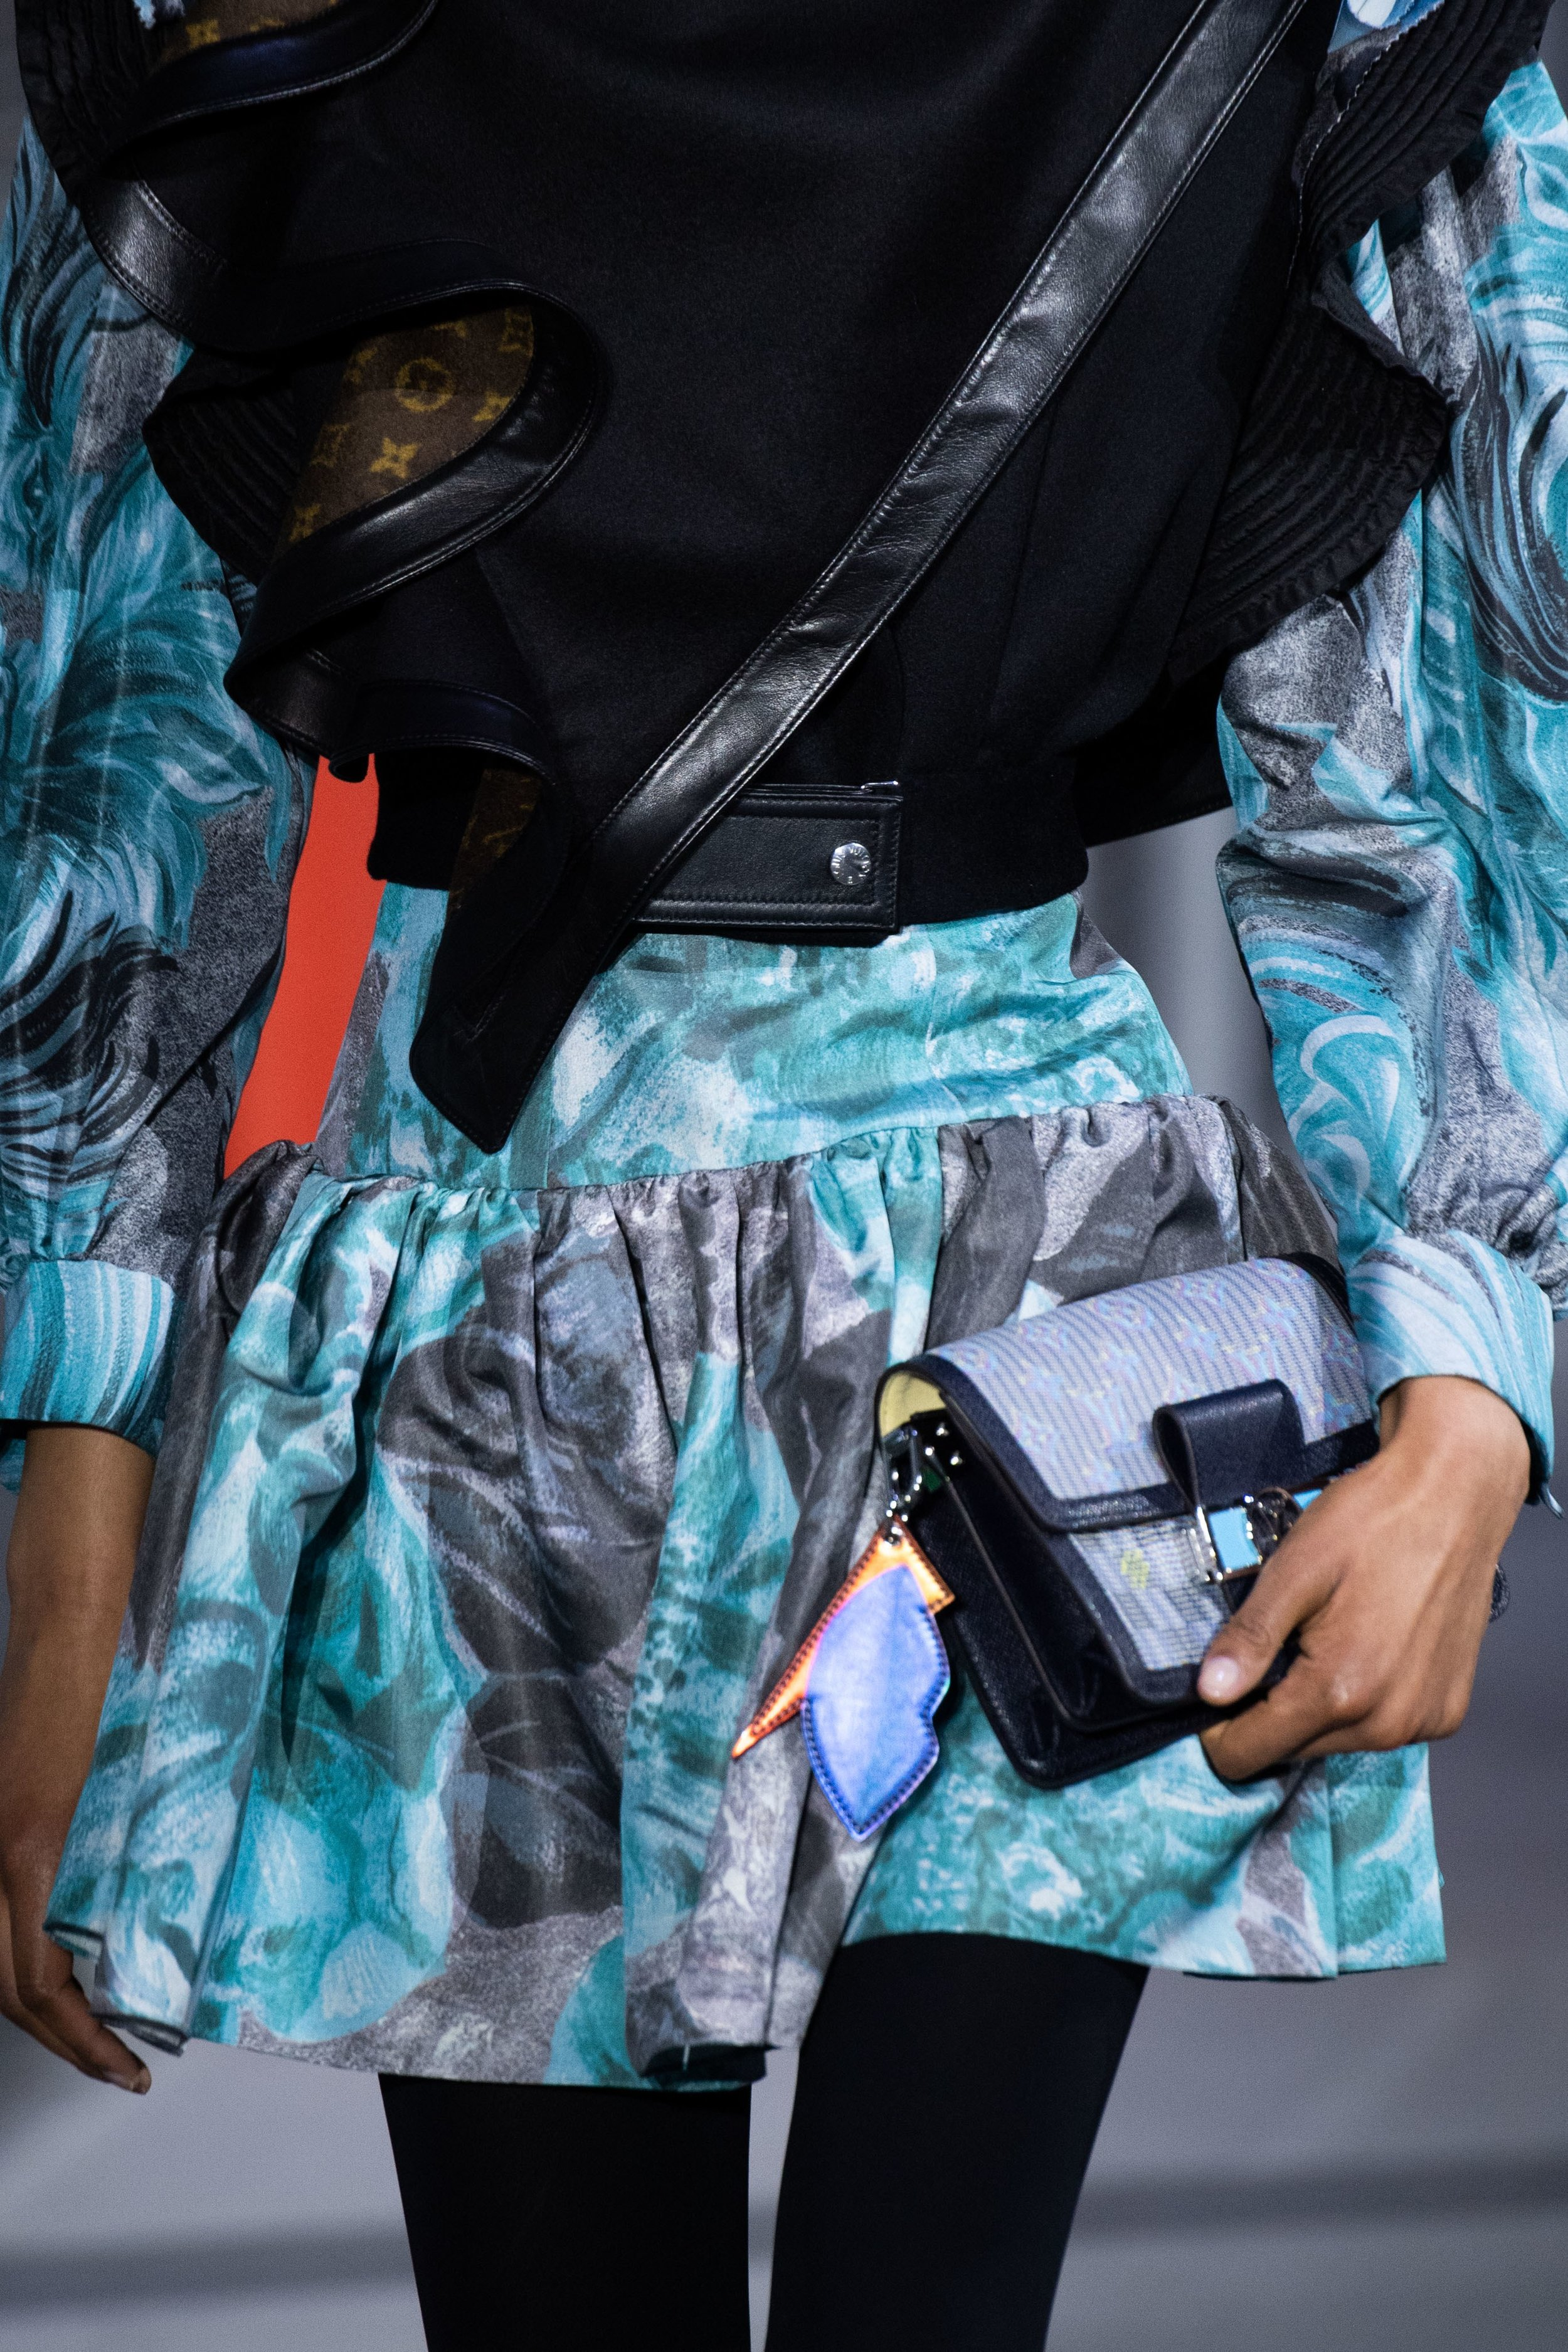 Louis-Vuitton-Black-Monogram-LV-Pop-Dauphine-Bag-Fall-2019.jpg